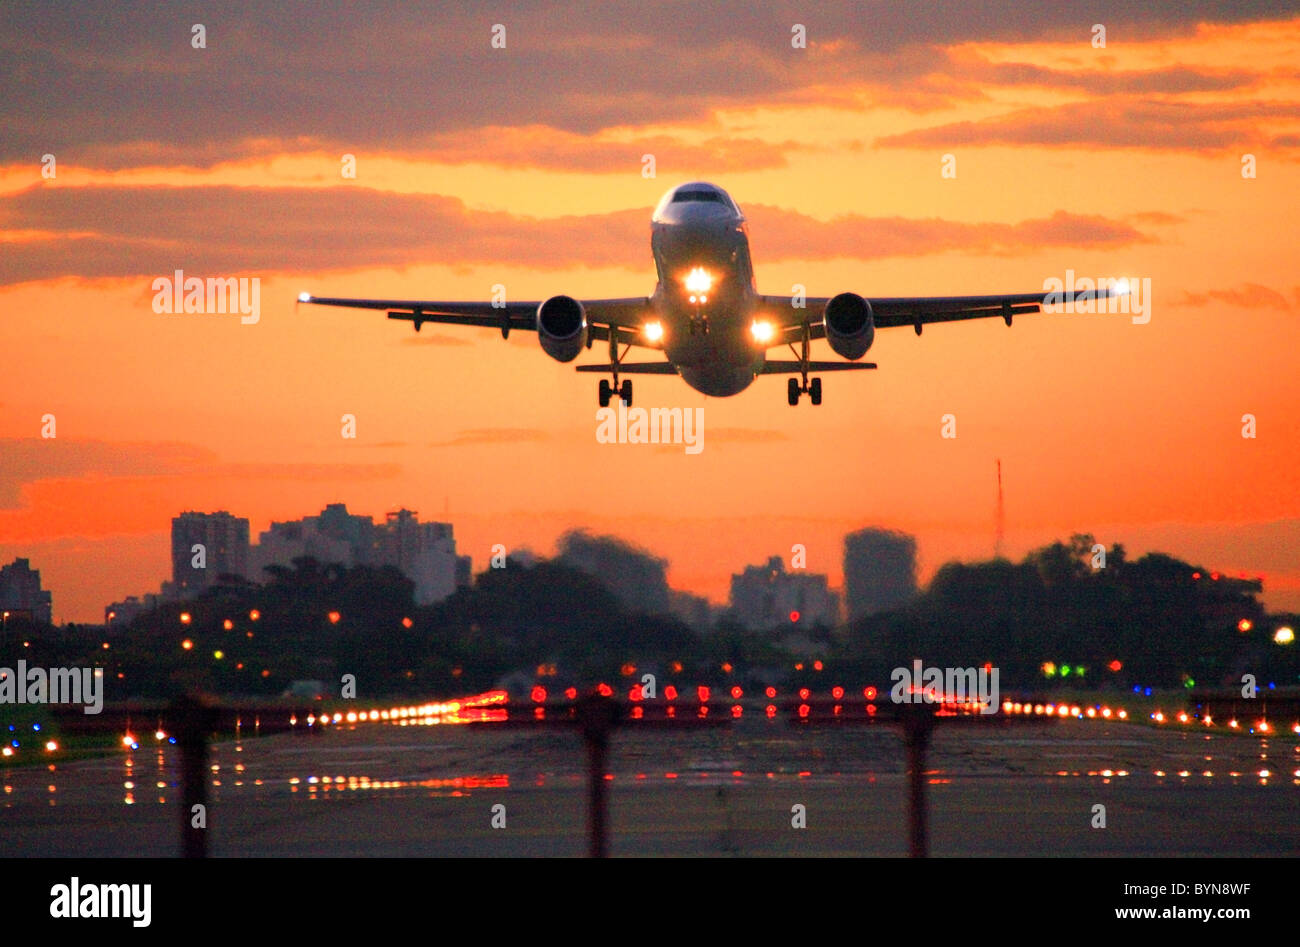 kommerzielle Düsenflugzeug ausziehen Jorge Newbery Flughafen bei Sonnenuntergang. Stockbild